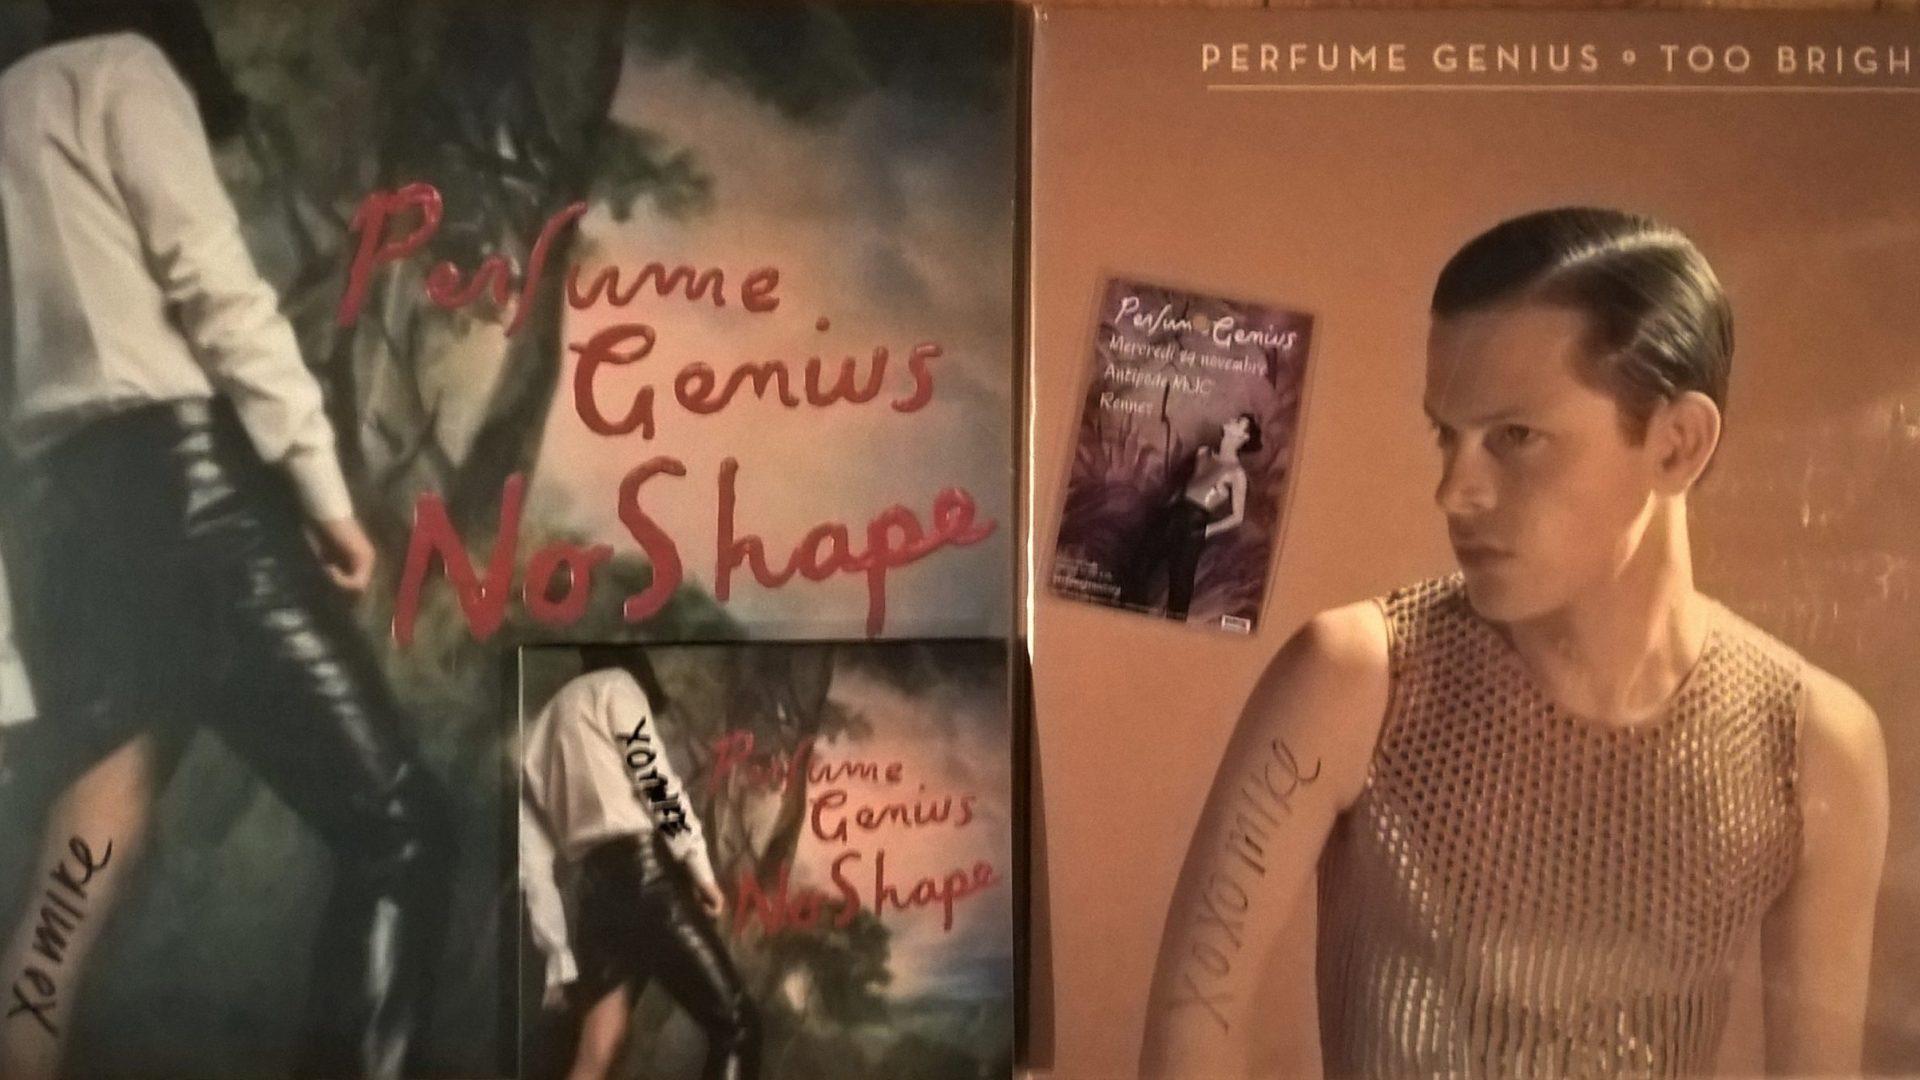 Perfume Genius talent confirmé photo benoit